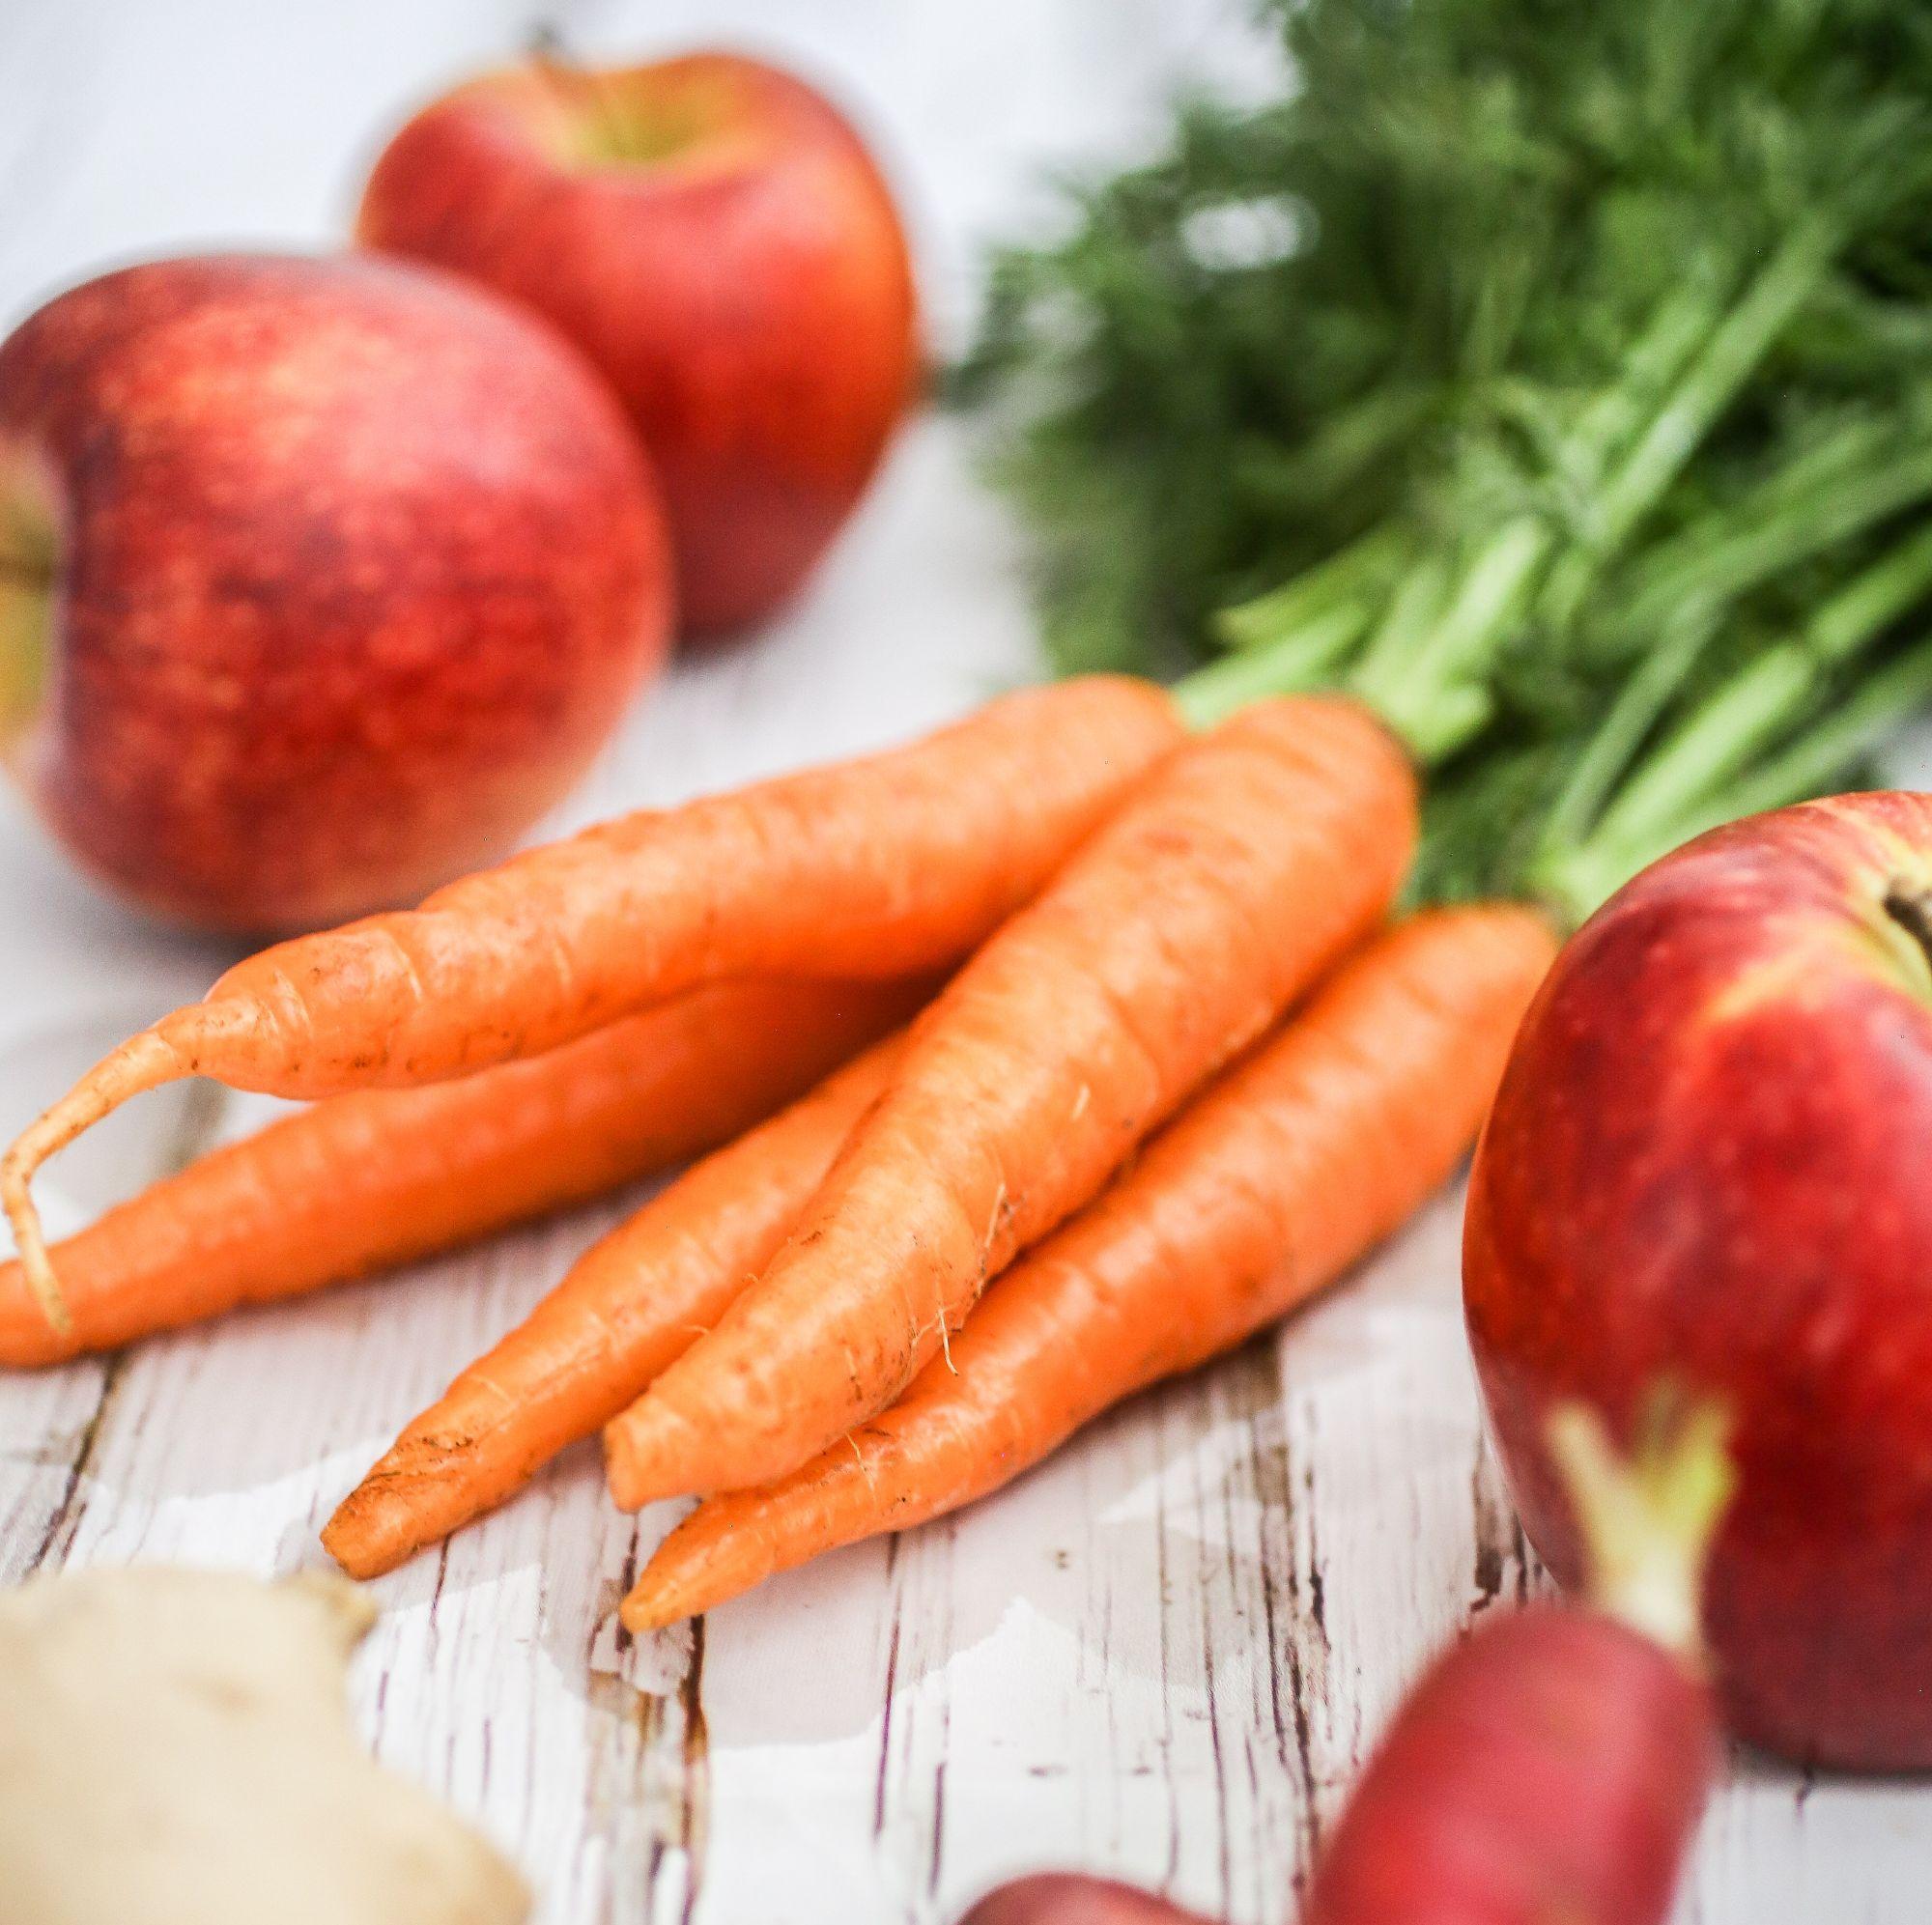 Fruit and veg - grain free dog food blog